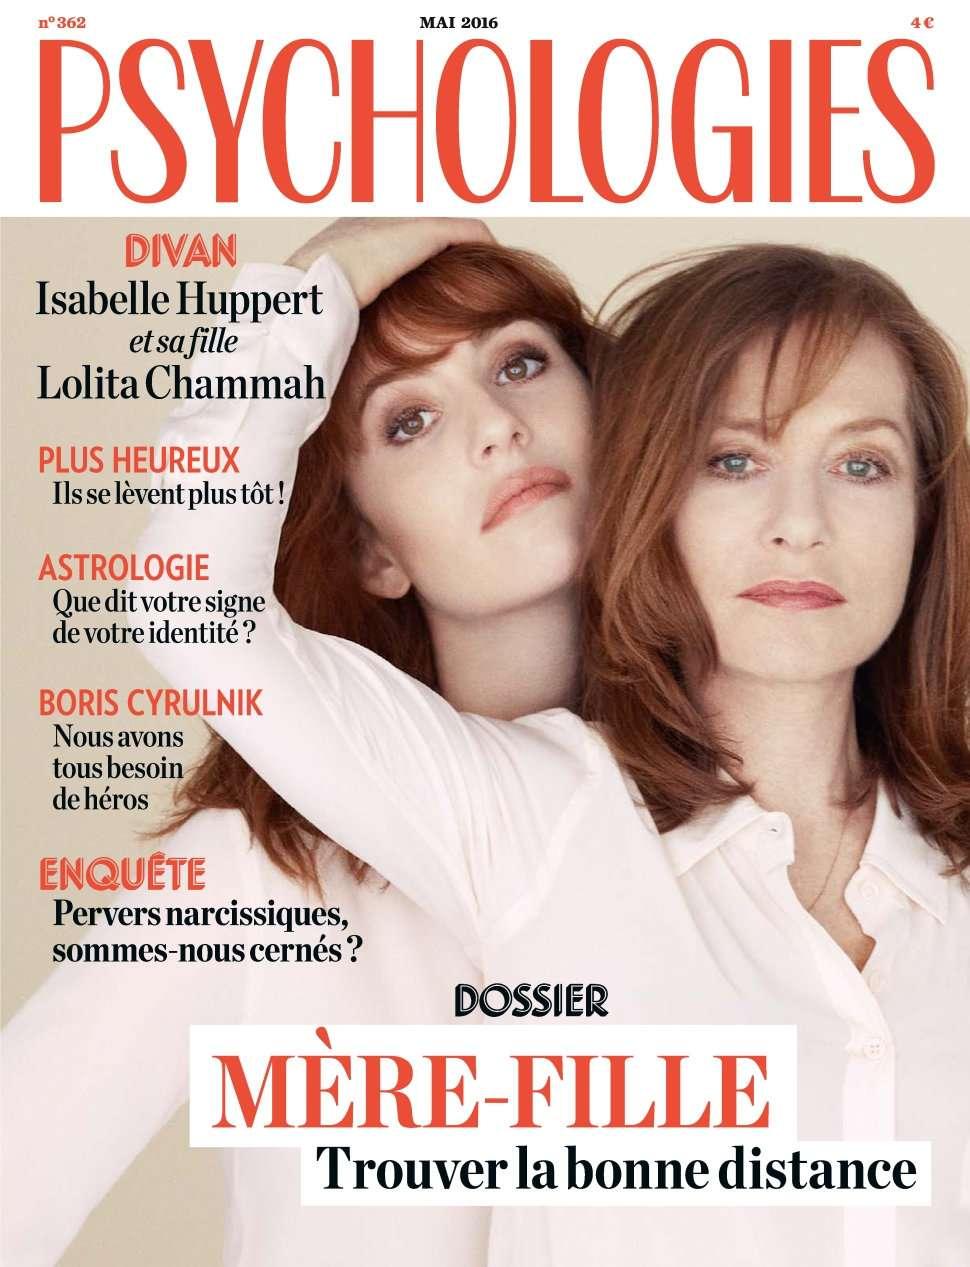 Psychologies magazine 362 - Mai 2016